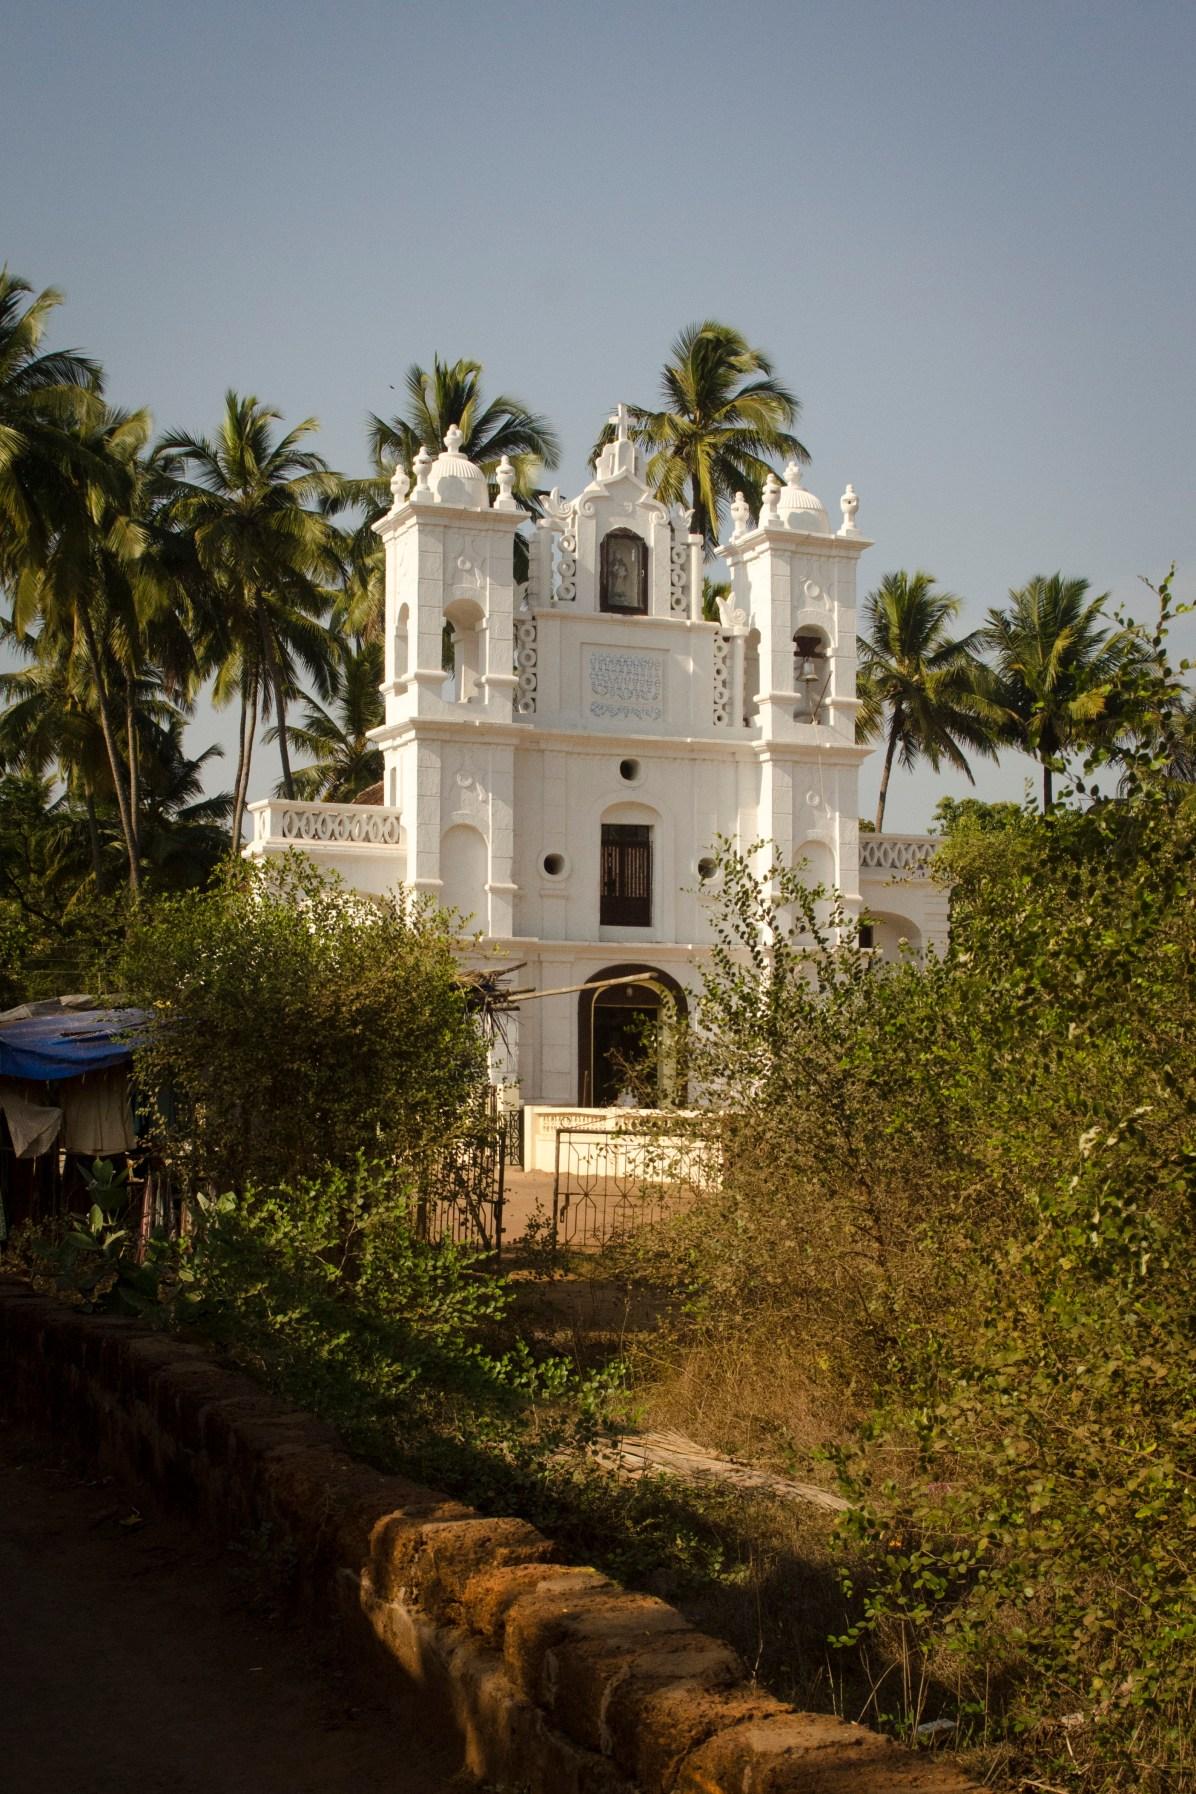 Goa Travel Blog Beach: It's a Catholic Part of India! Where to stay in Goa